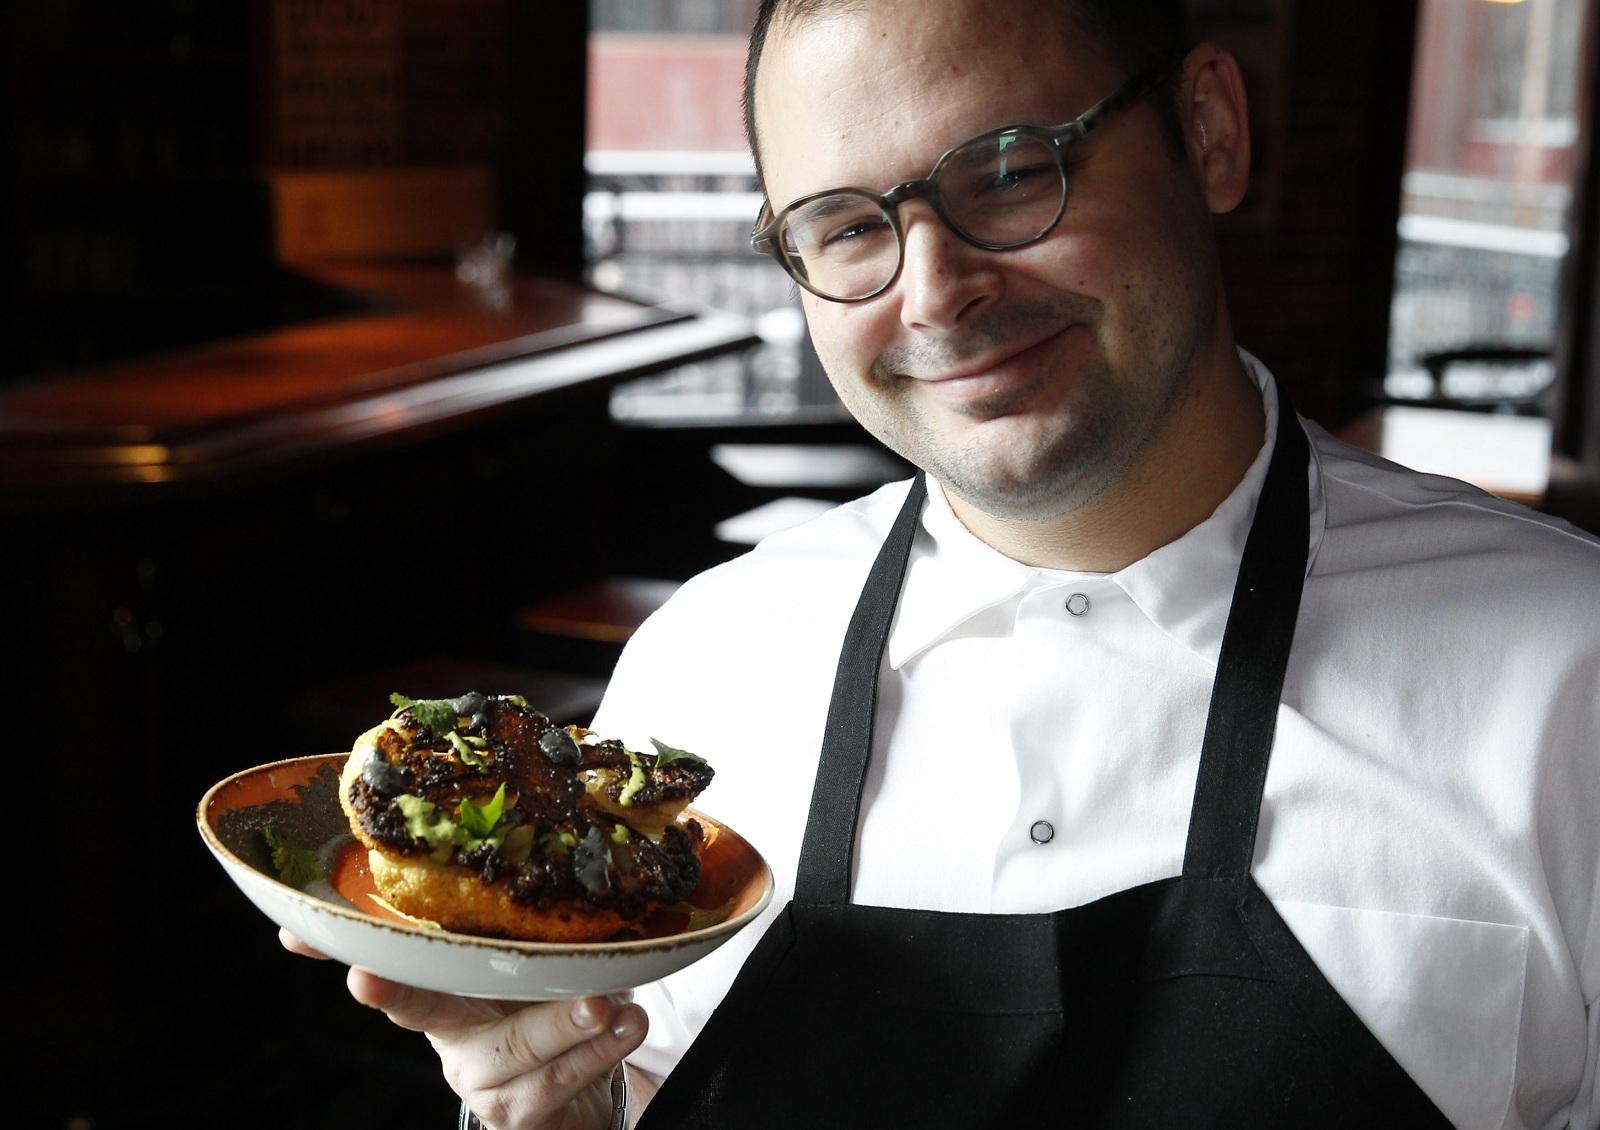 Buffalo Proper Executive Chef Edward Forster has crafted a popular brunch menu. (Sharon Cantillon/Buffalo News file photo)